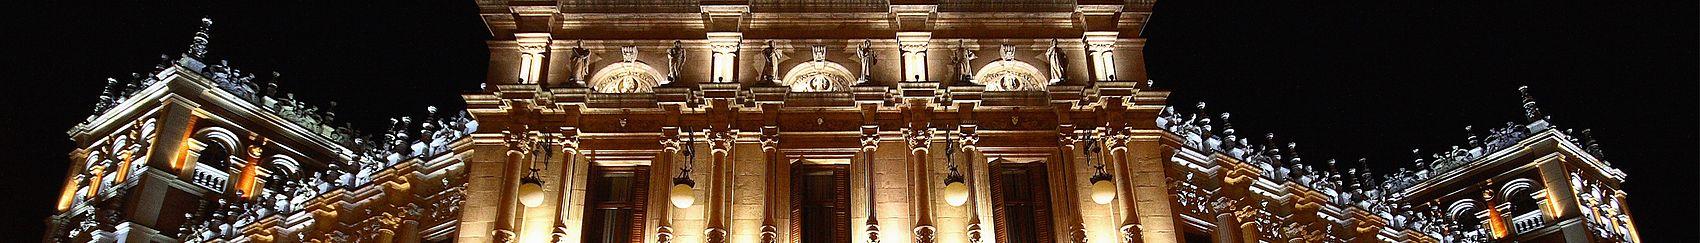 Locapedias de Palencia